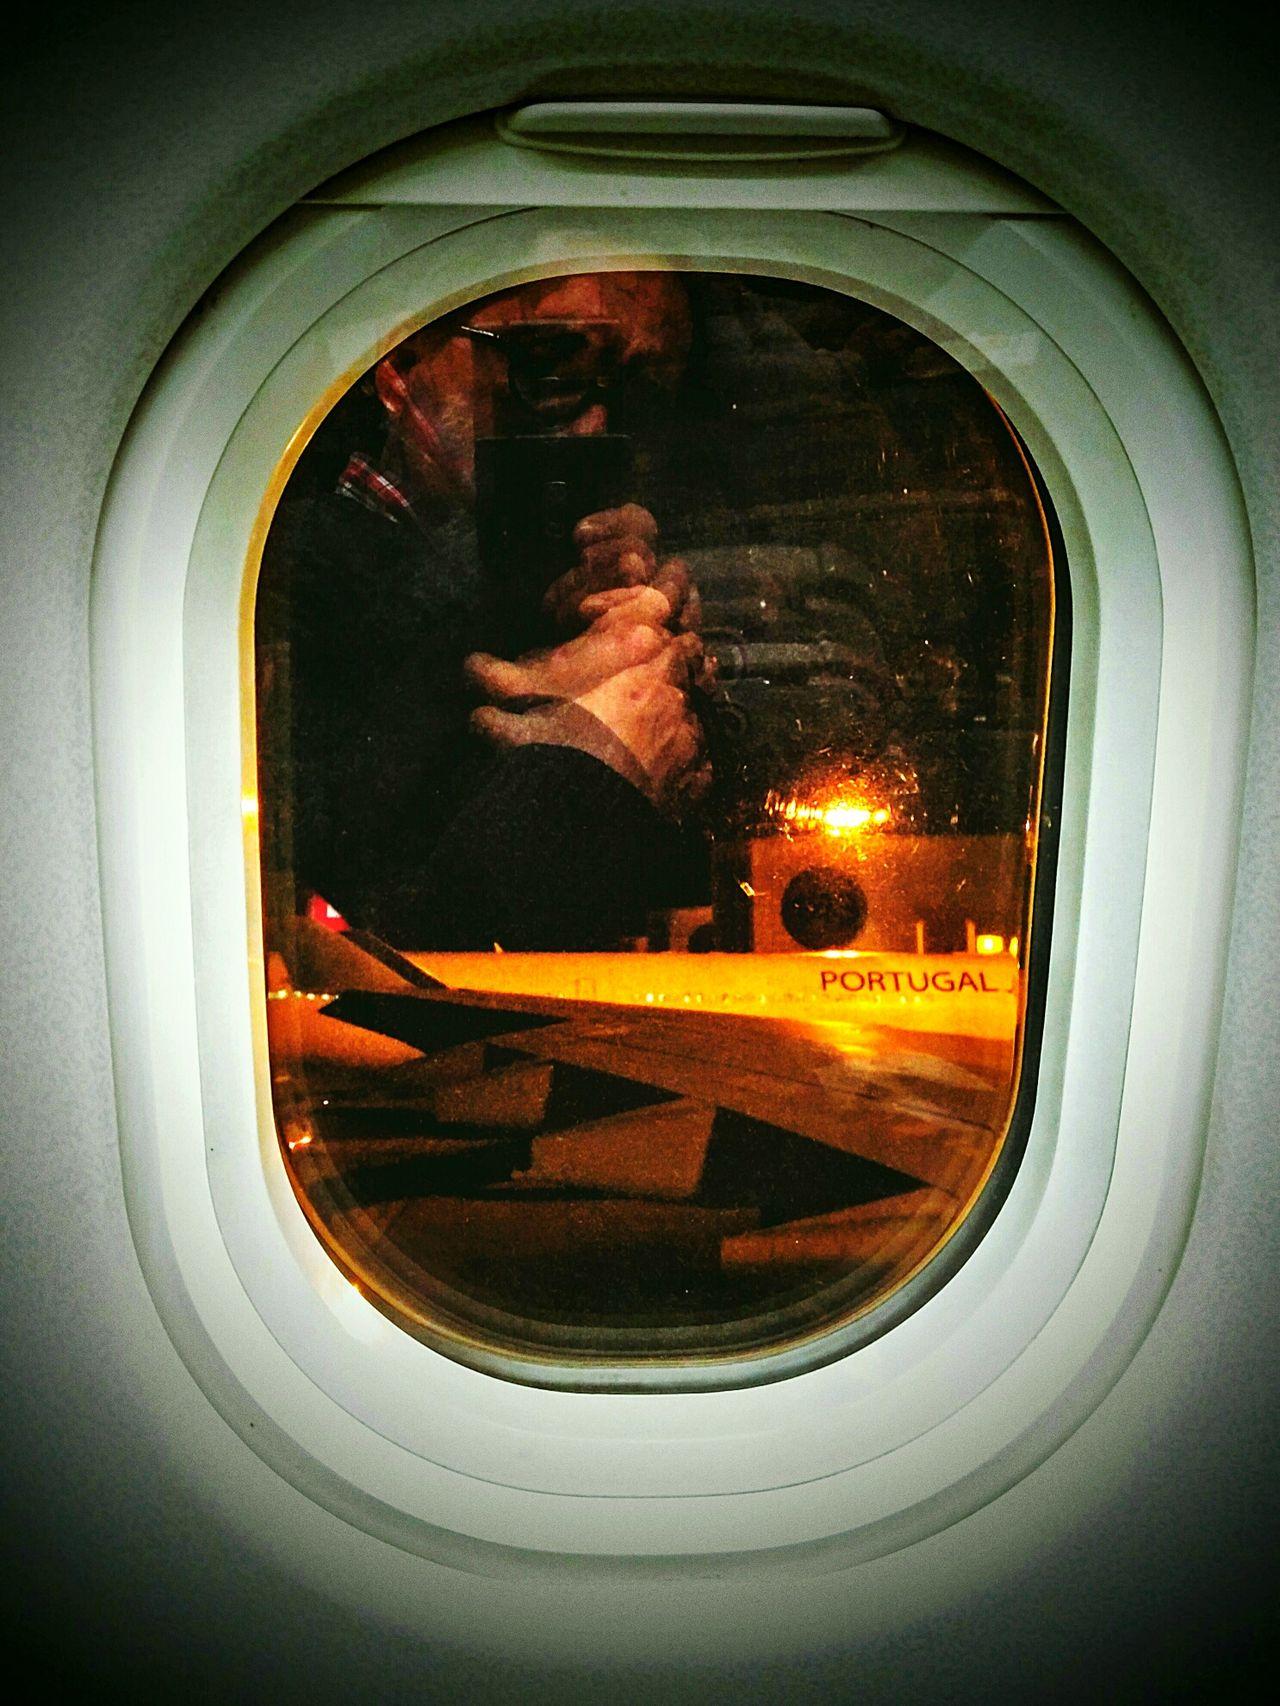 Sefl Portrait Lisboa Portugal From An Airplane Window Tap Lisboa/maputo